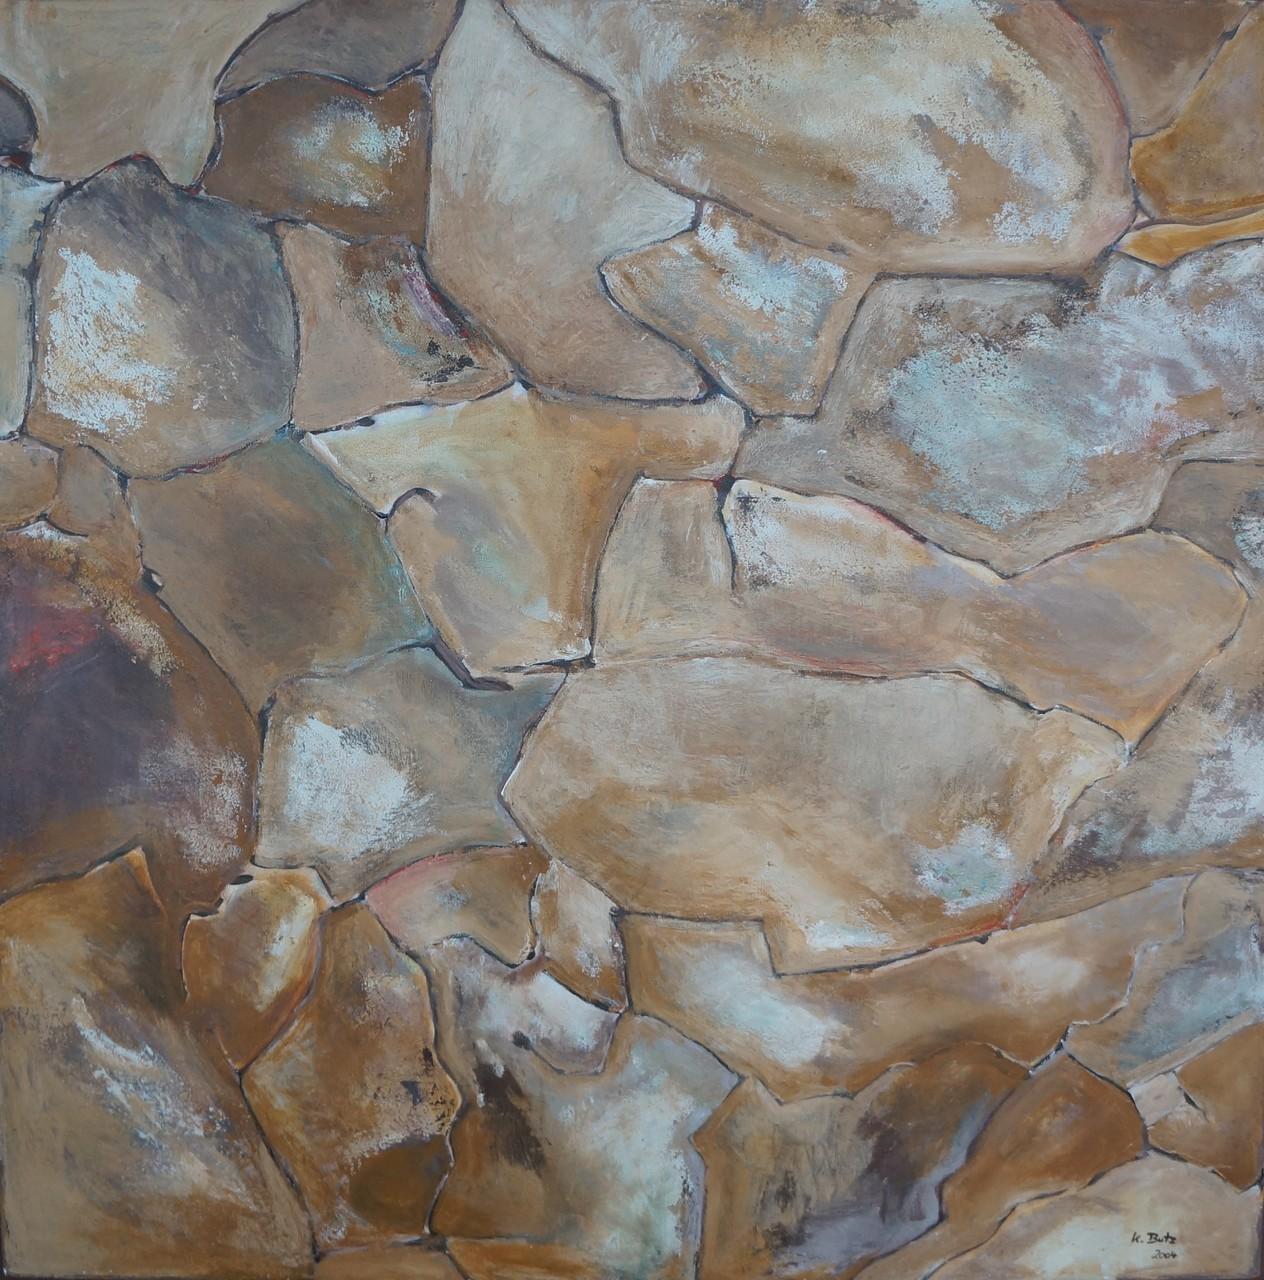 Erde, 2004, Acryl auf Leinwand, 100x100